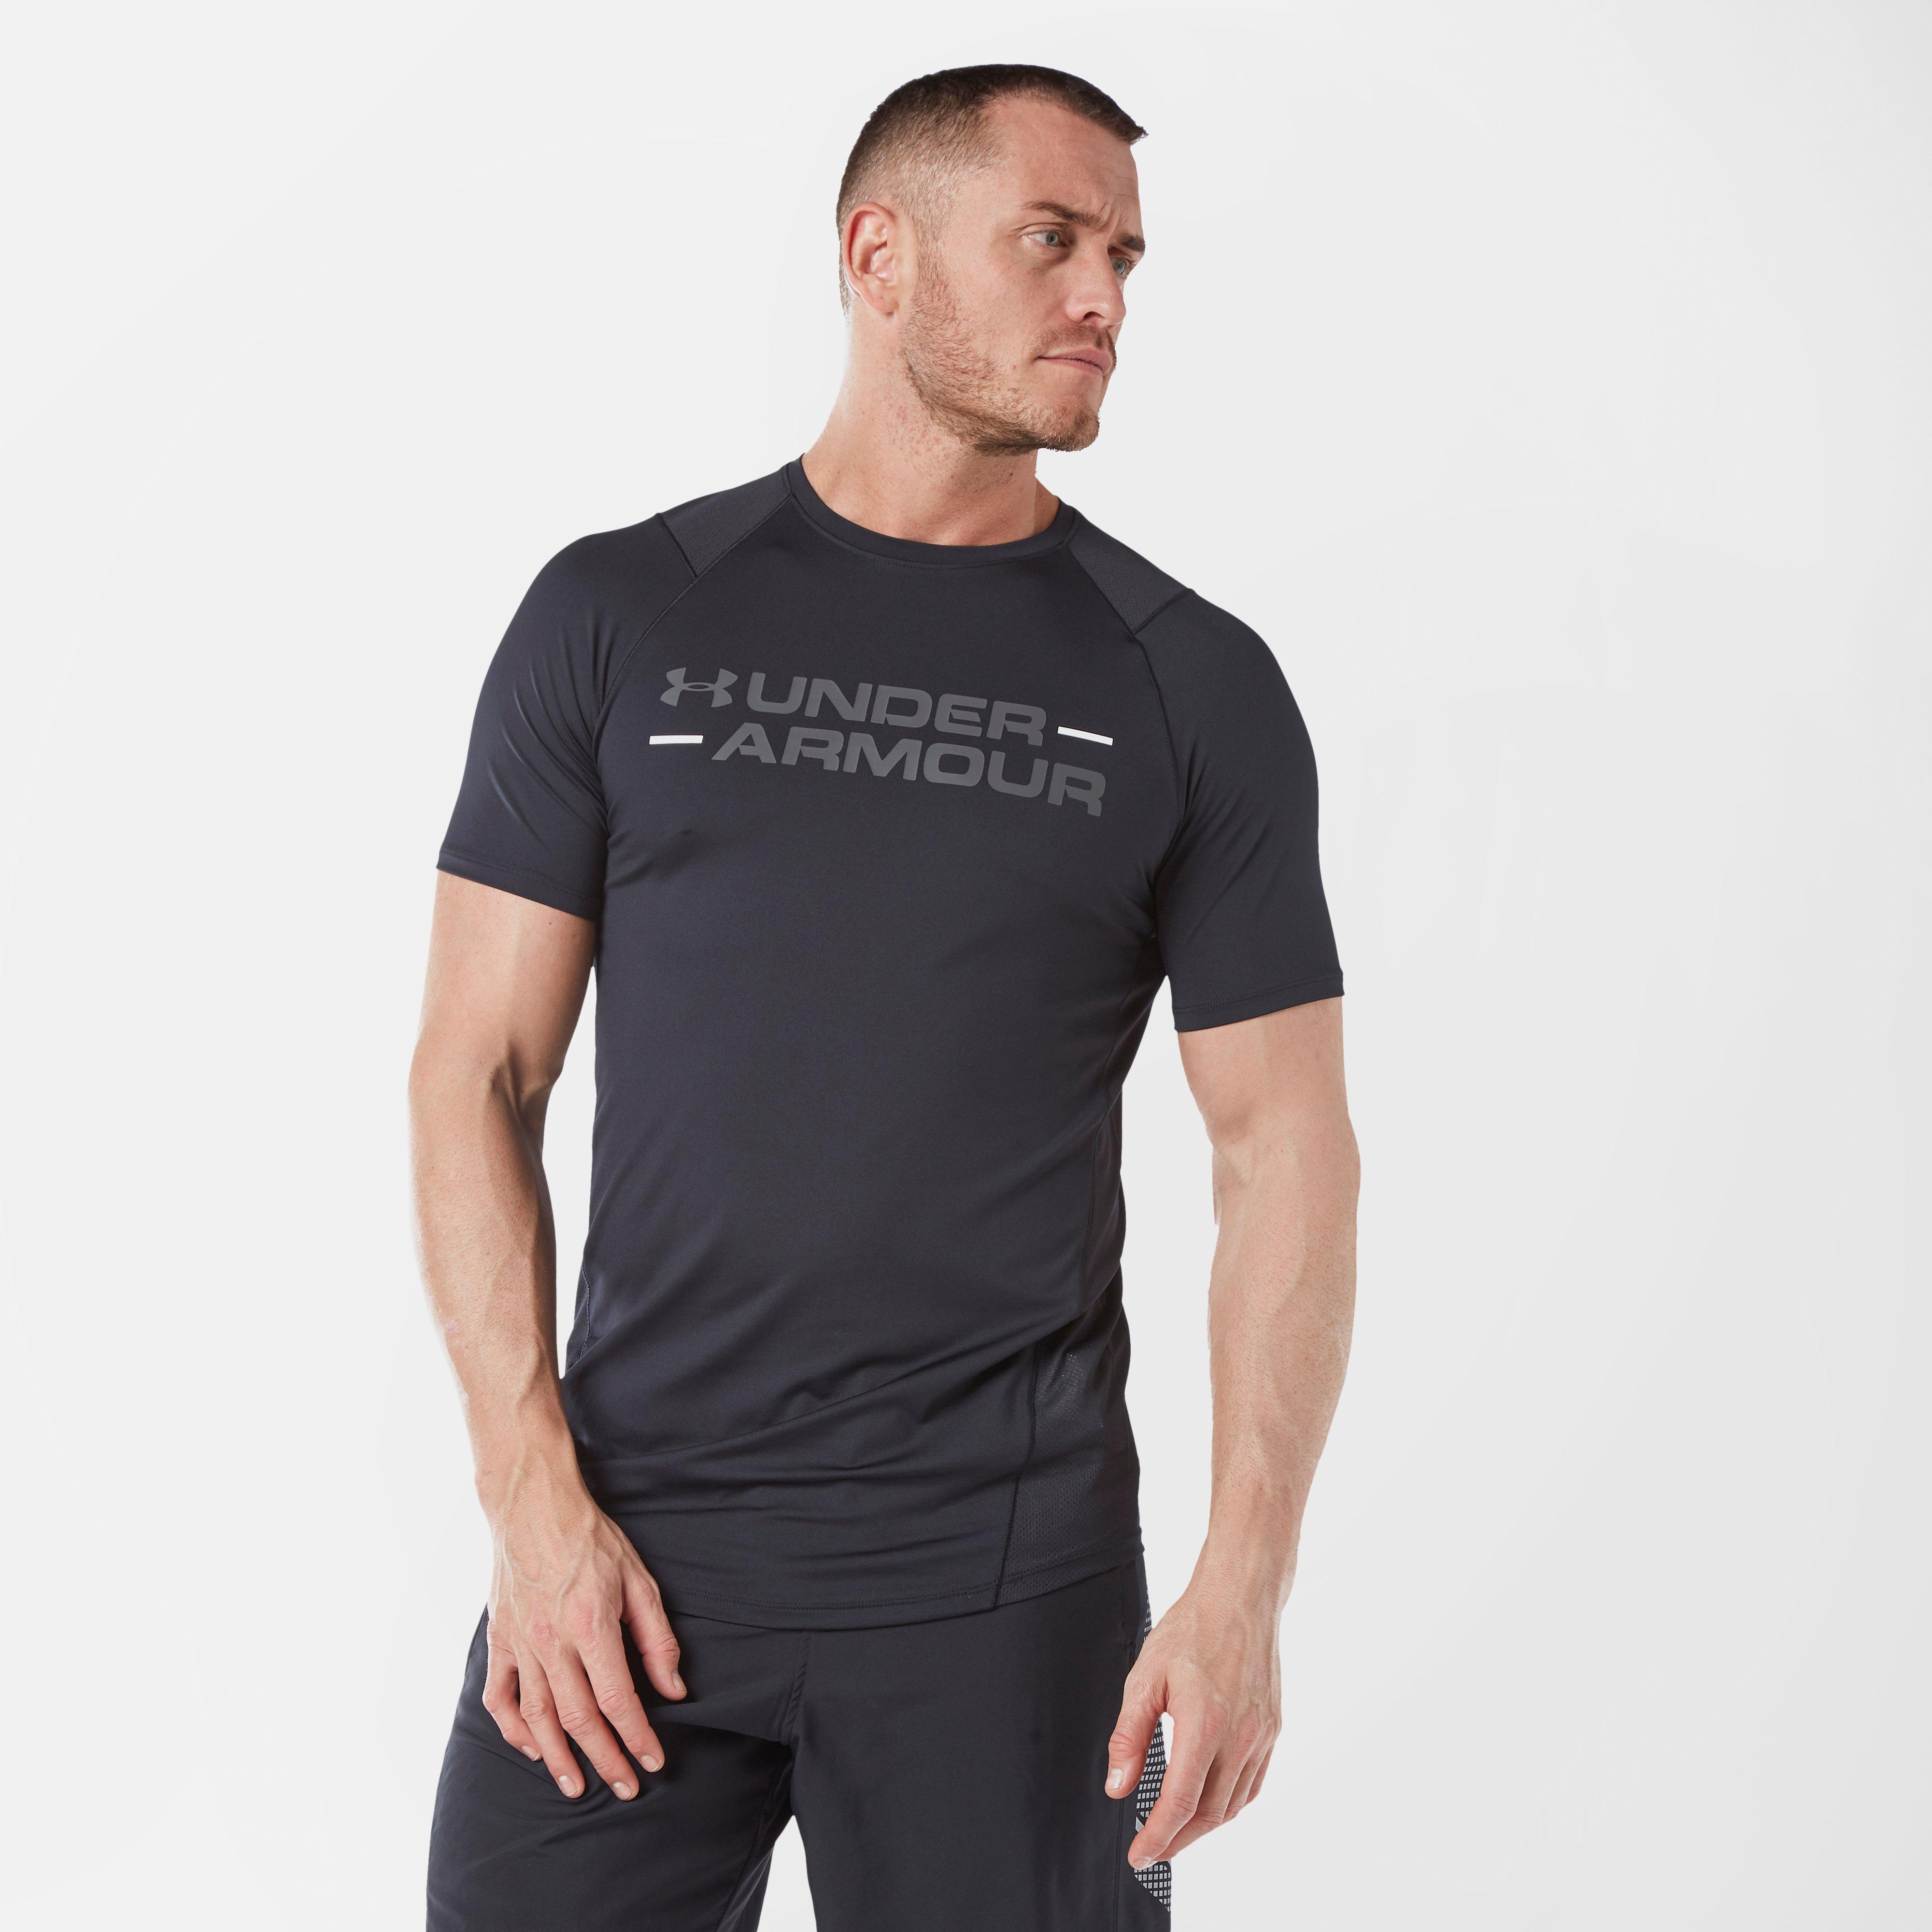 ebc66653 Men's MK-1 Wordmark Short Sleeve T-Shirt